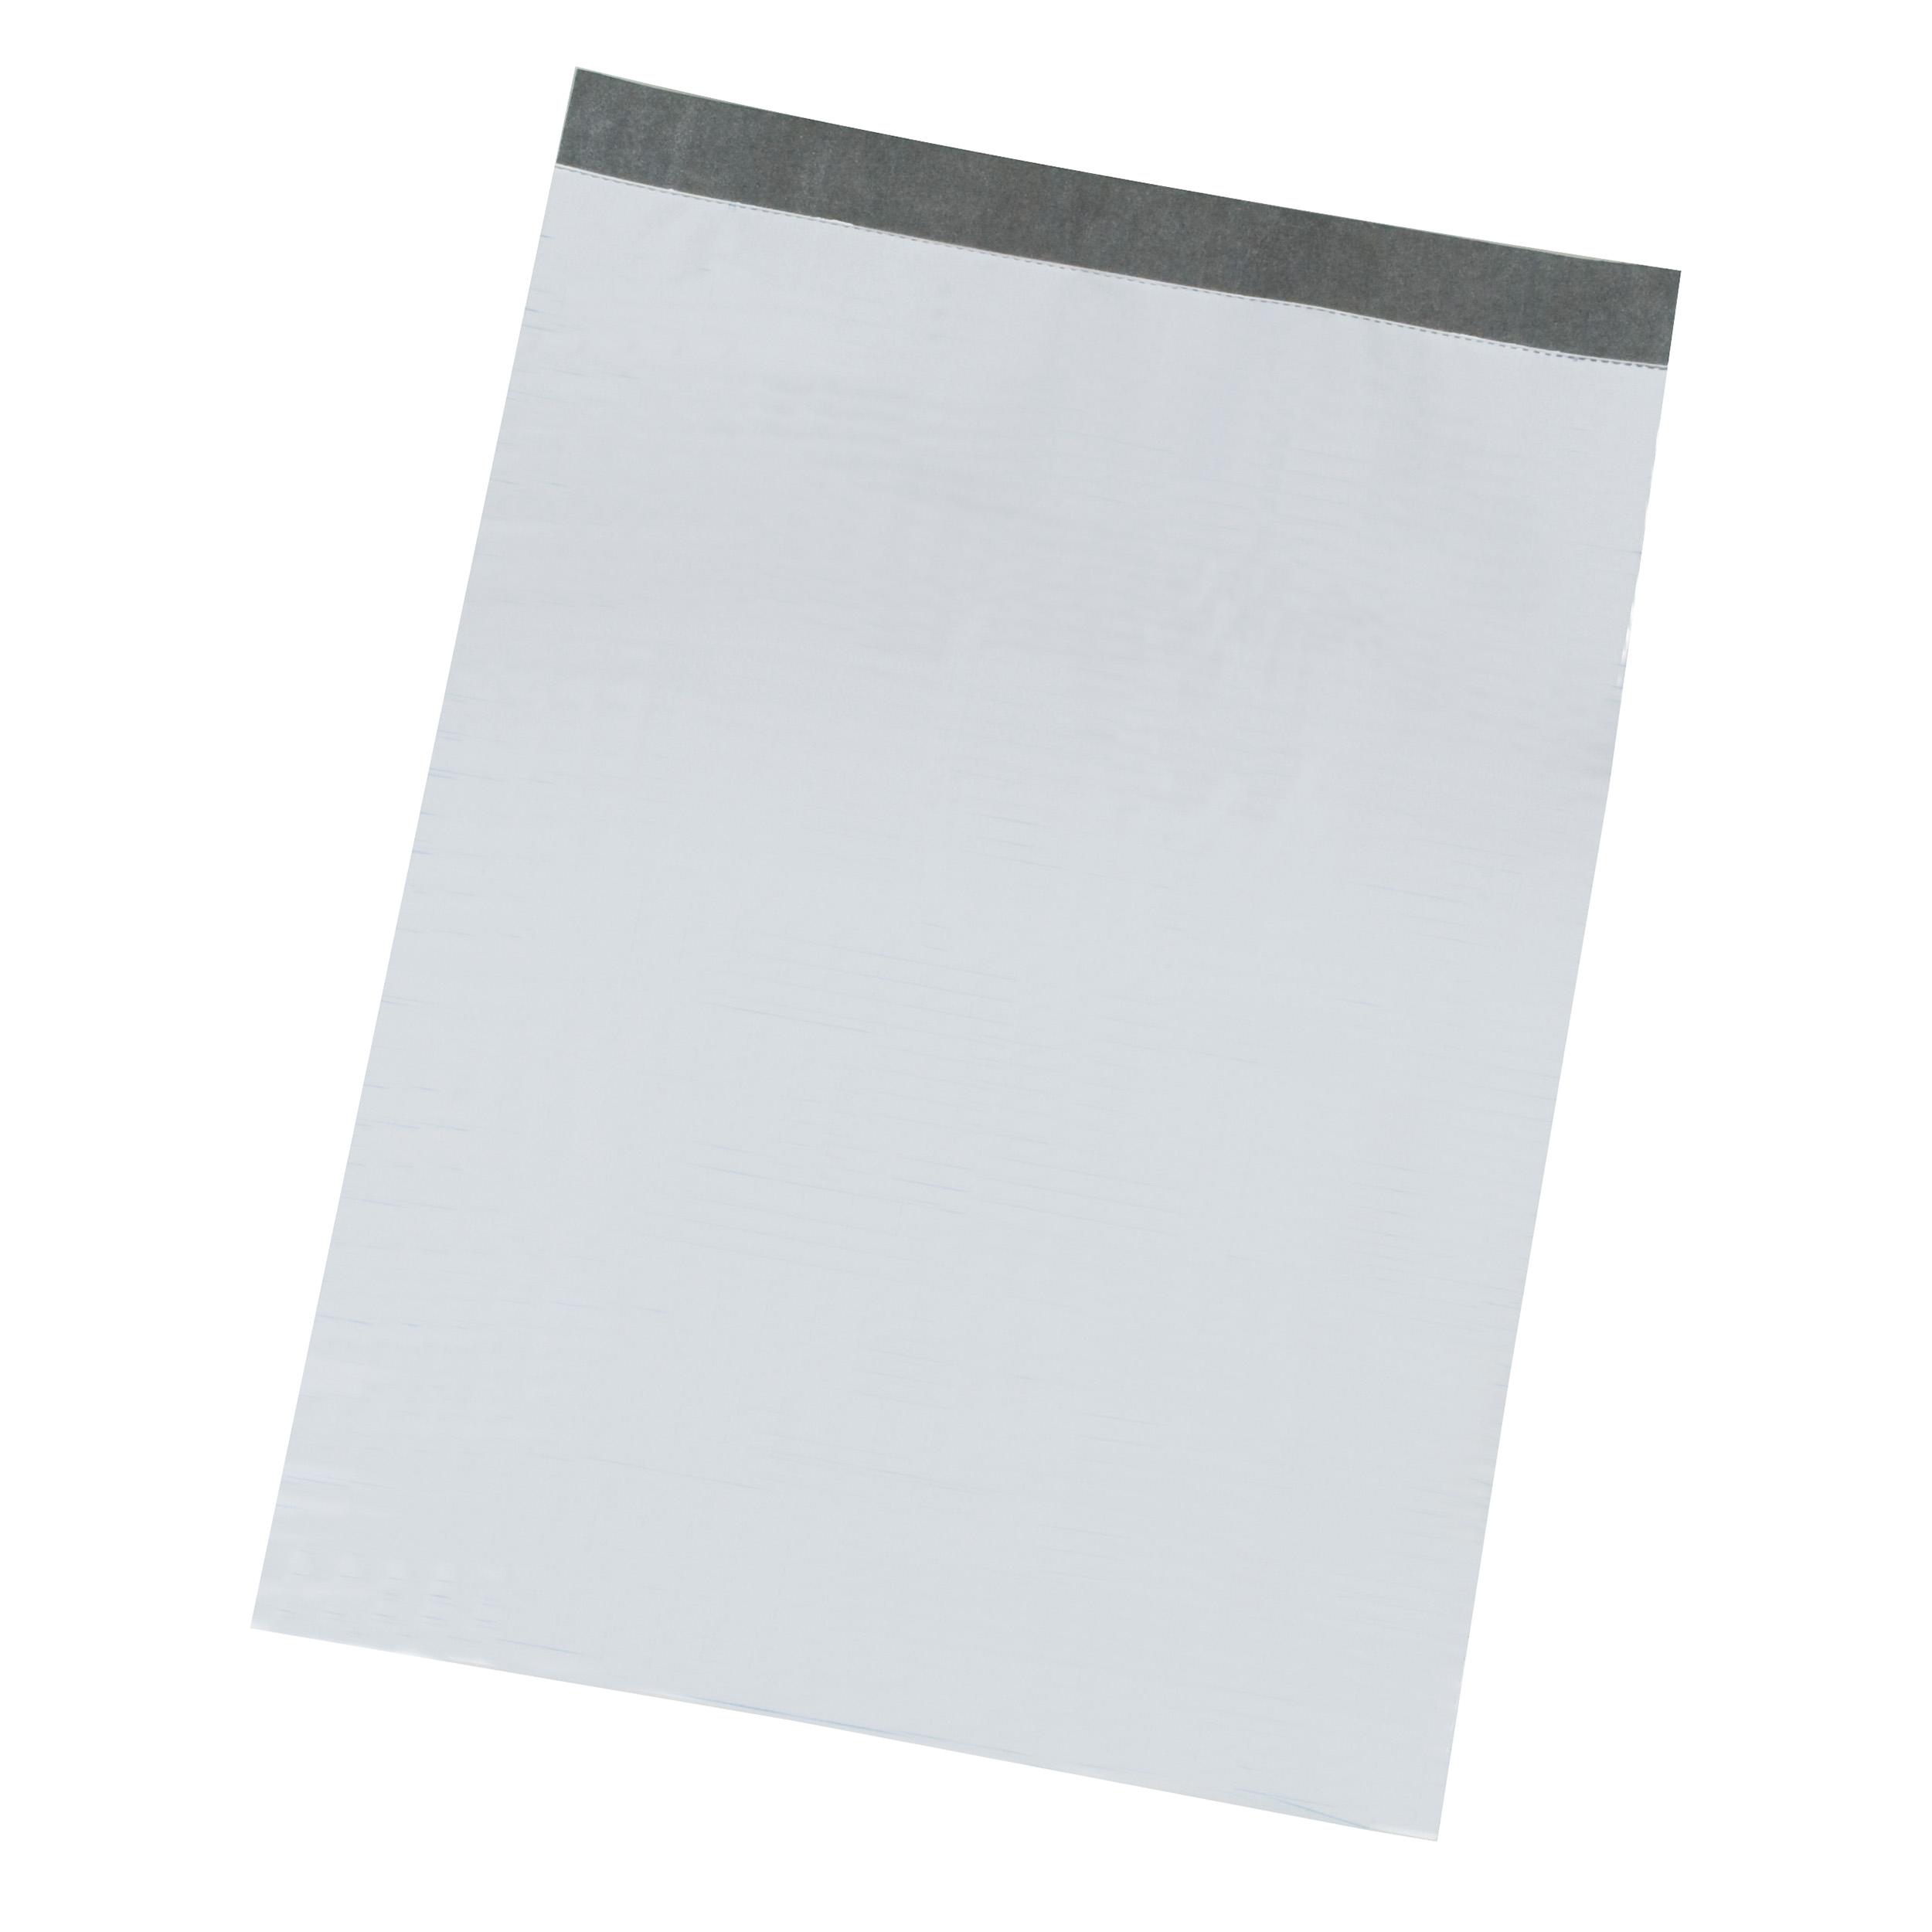 Schreibblock unliniert, 50 Blatt